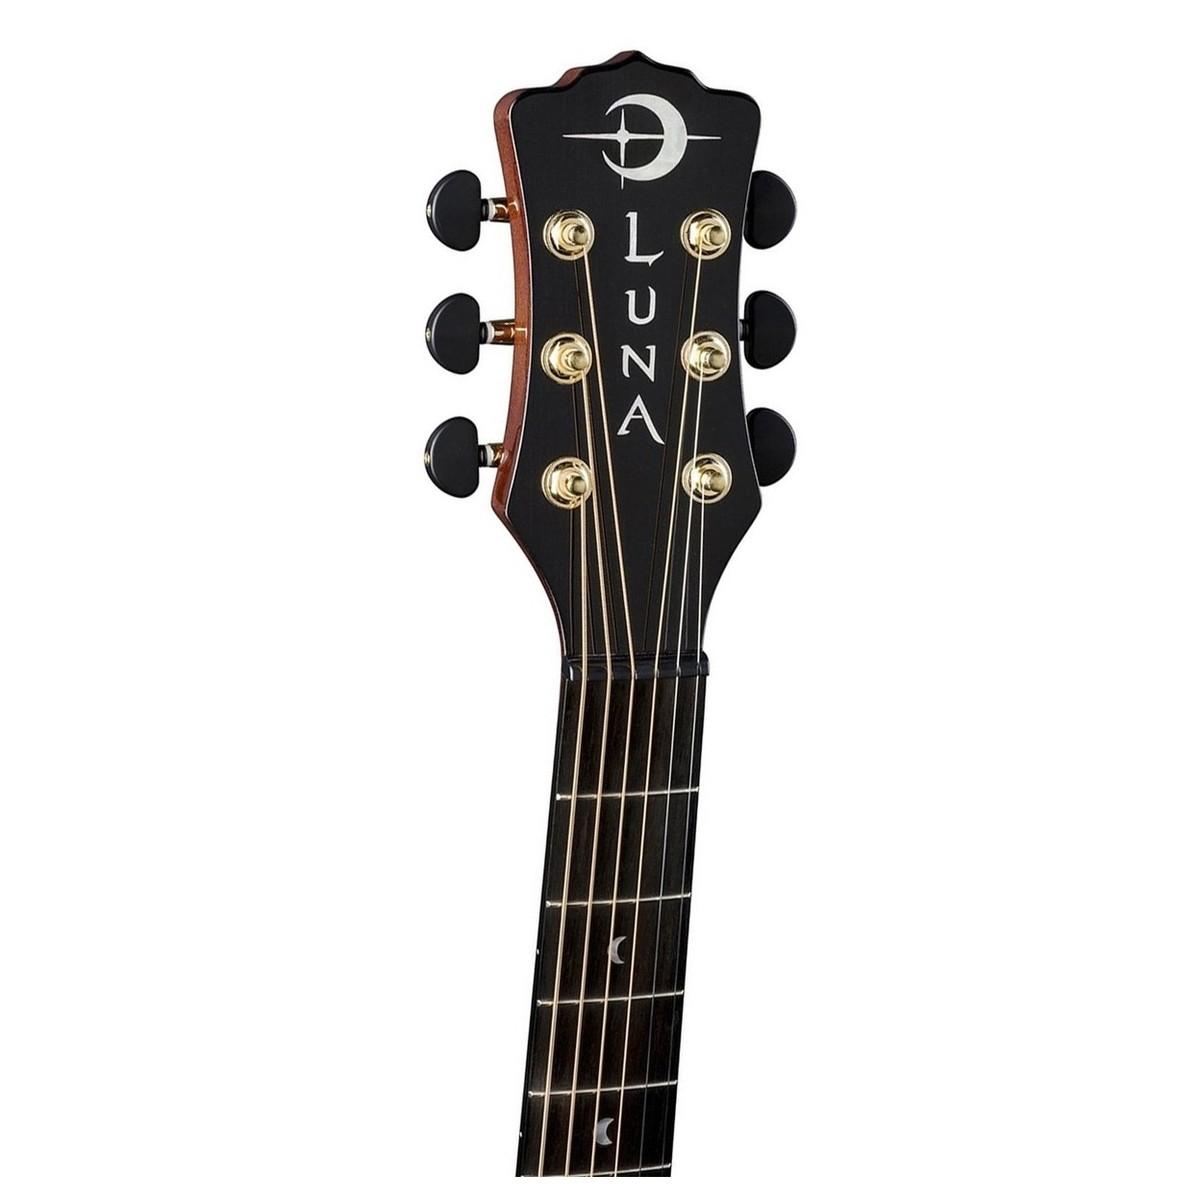 Luna Vista Deer Tropical Wood Electro Acoustic W Case At Gear4music